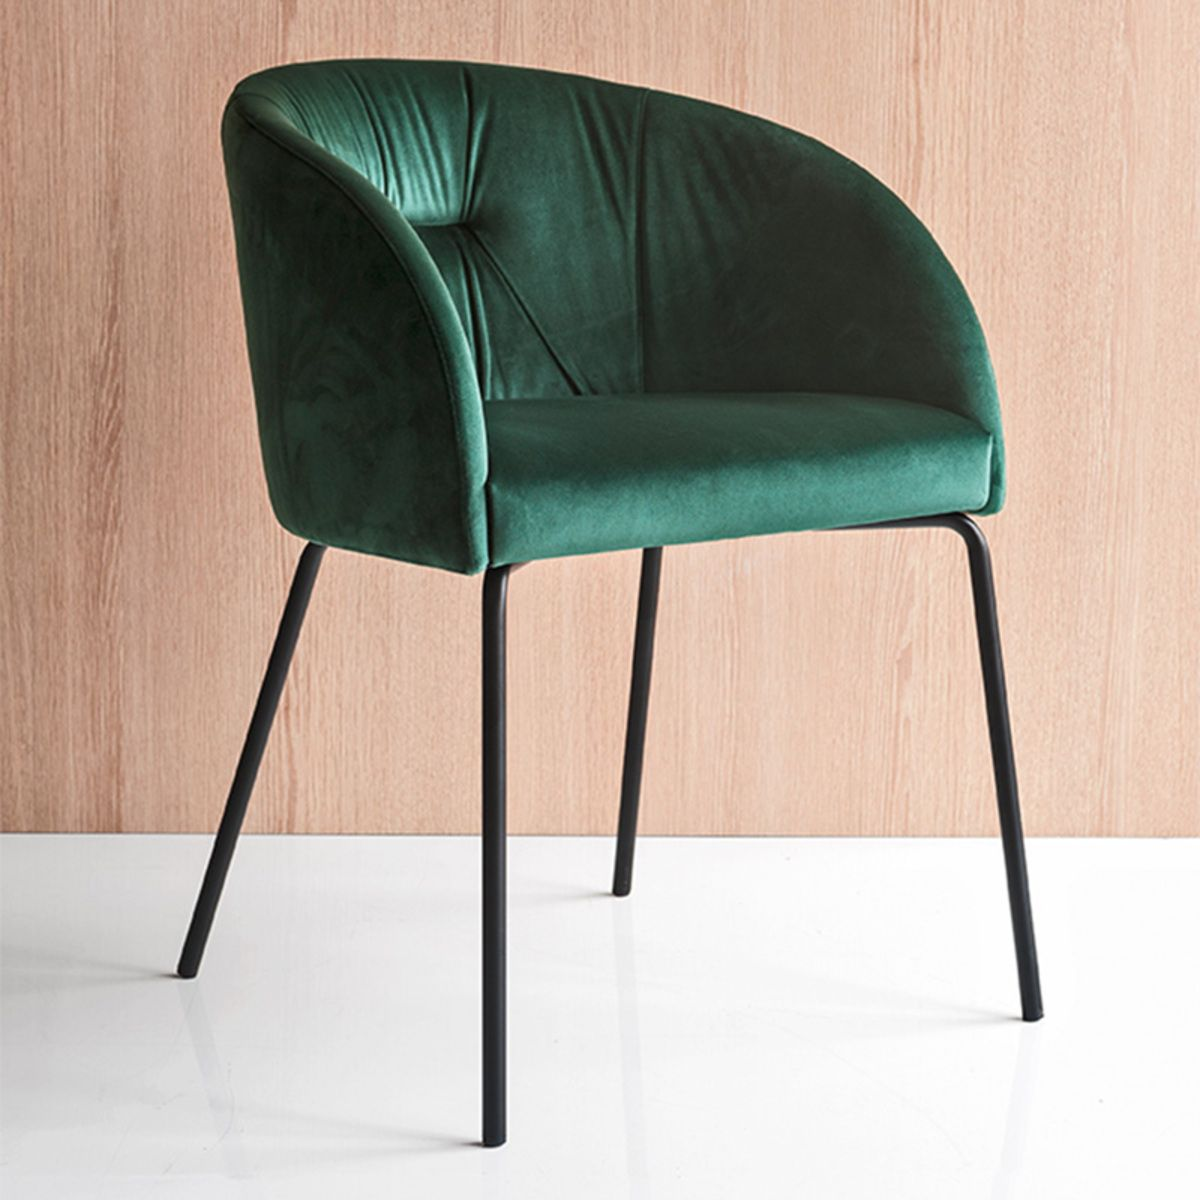 Chaise Salle A Manger Chaise Avec Accoudoirs Rosie Velours Vert